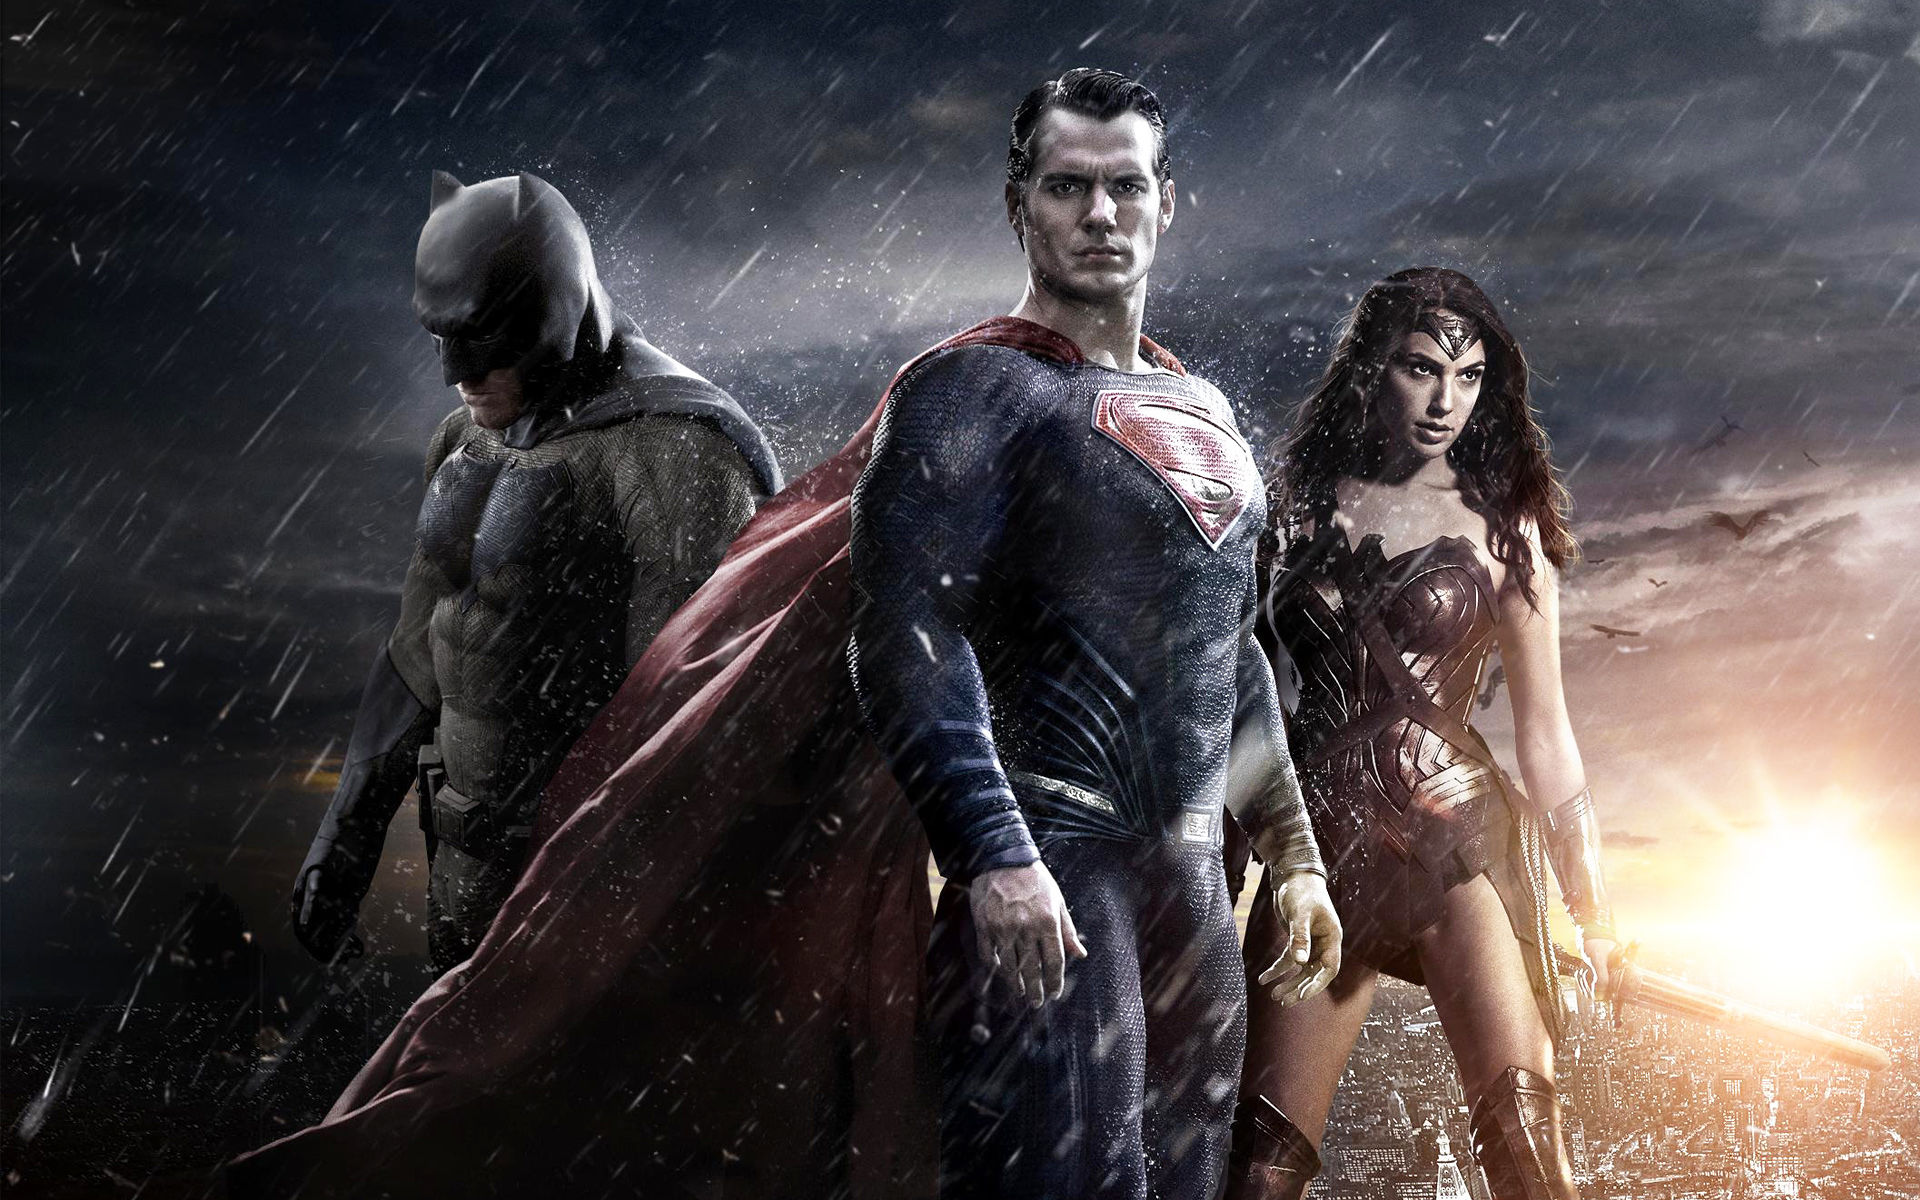 batman_superman_wonder_woman-wide-2-justice-league-movie-the-flash-shock-aquaman-more-jpeg-154421